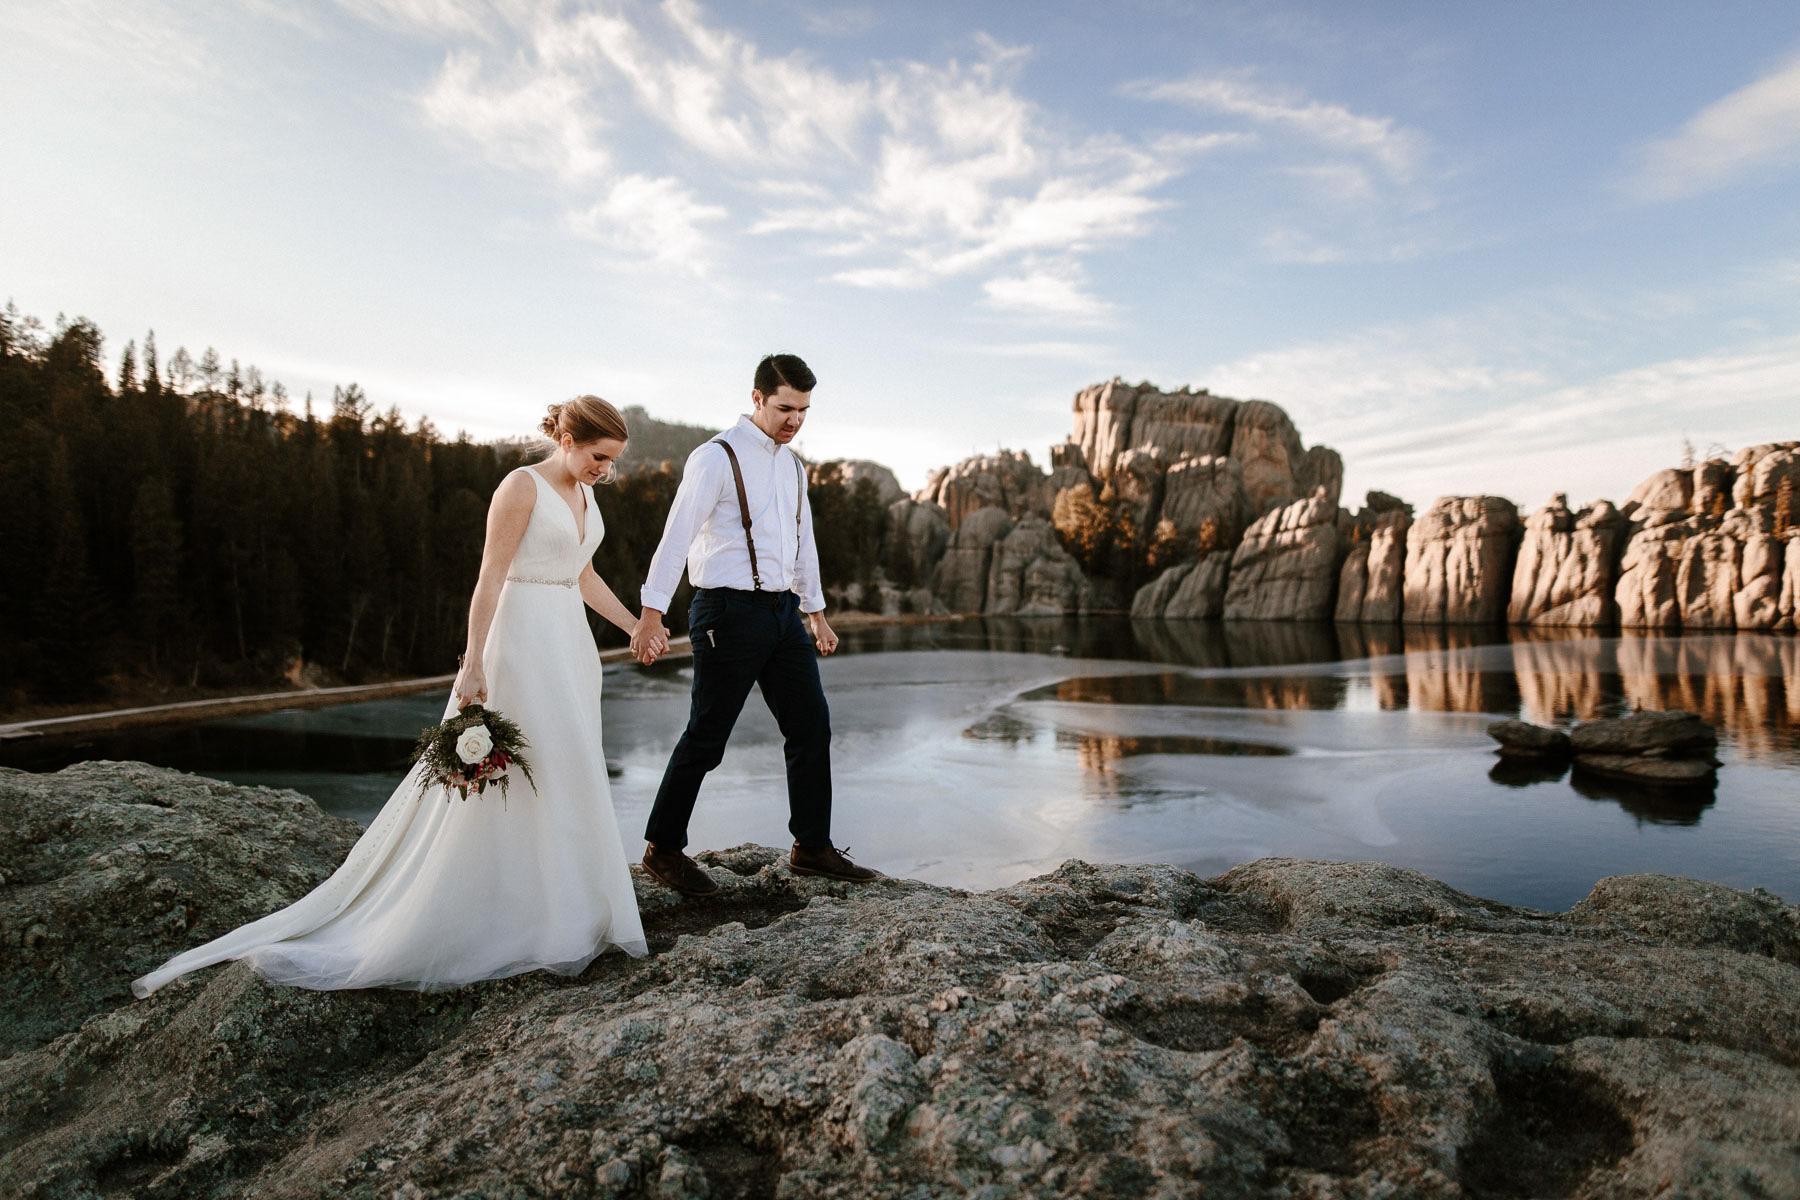 sioux-falls-black-hills-rapid-city-elopement-wedding-adventure-photographer-custer-sylvan-lake-31.jpg